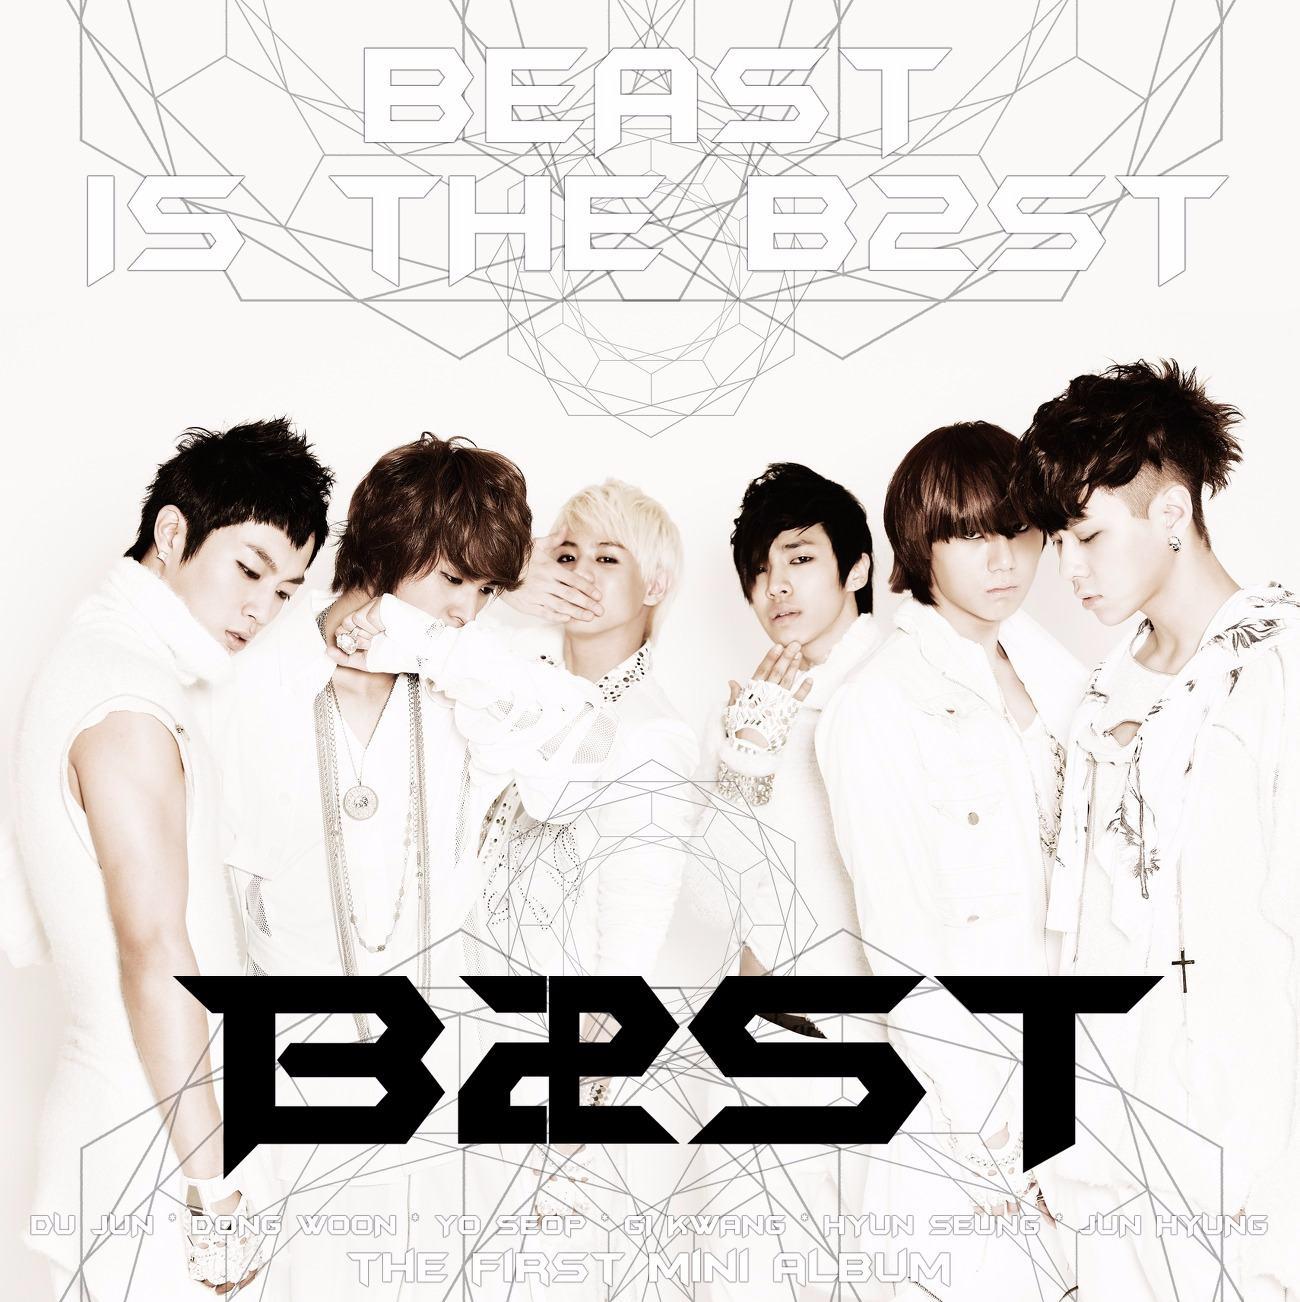 BEAST 出道日期: 2009年10月16日 恩...野獸妝XDDD